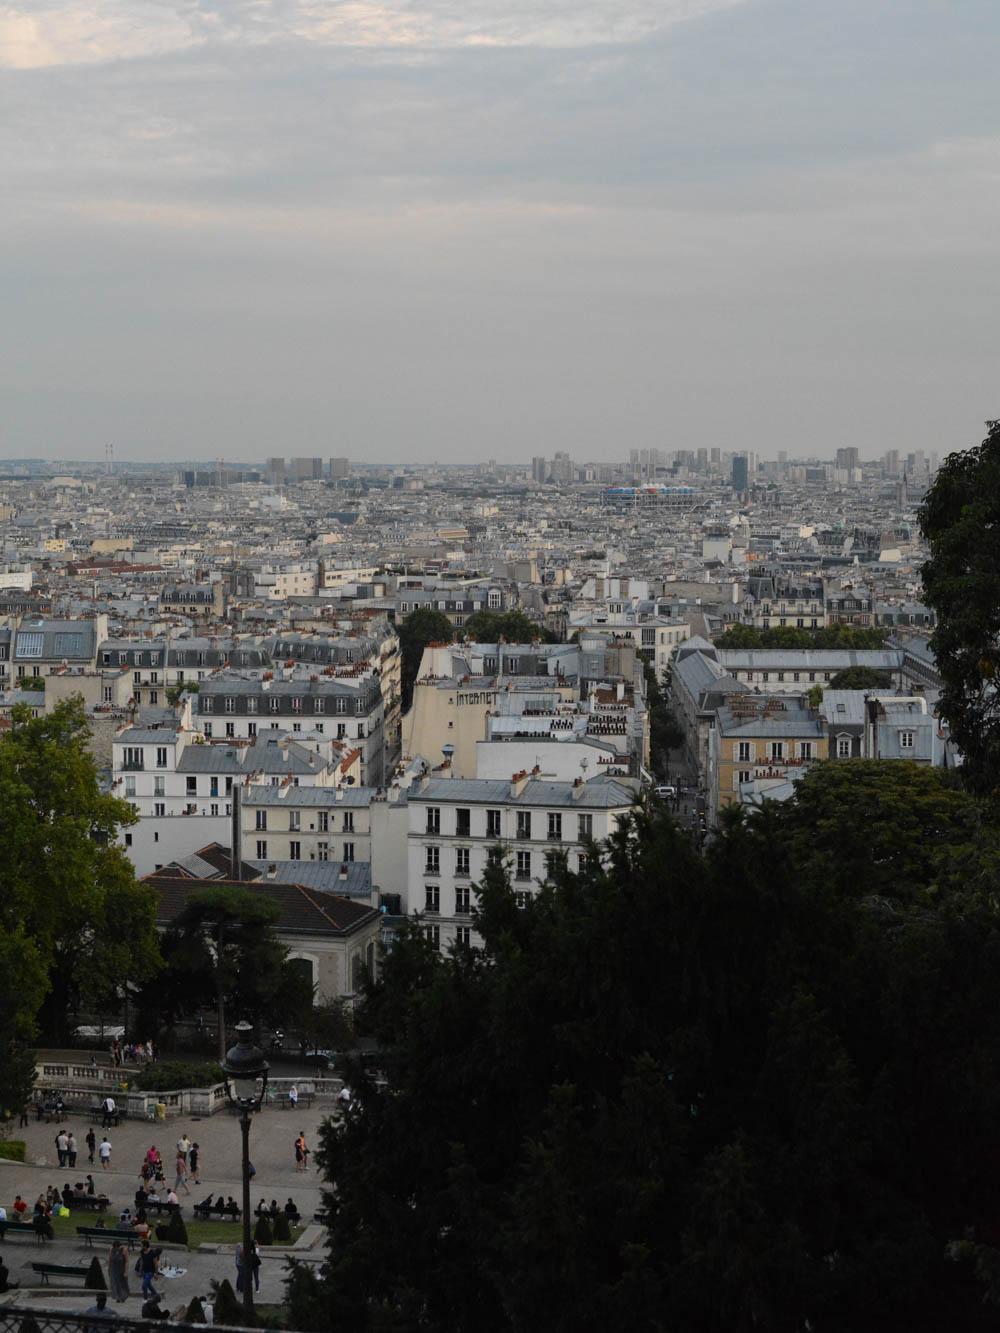 paris-rooftops-montmarte.jpg